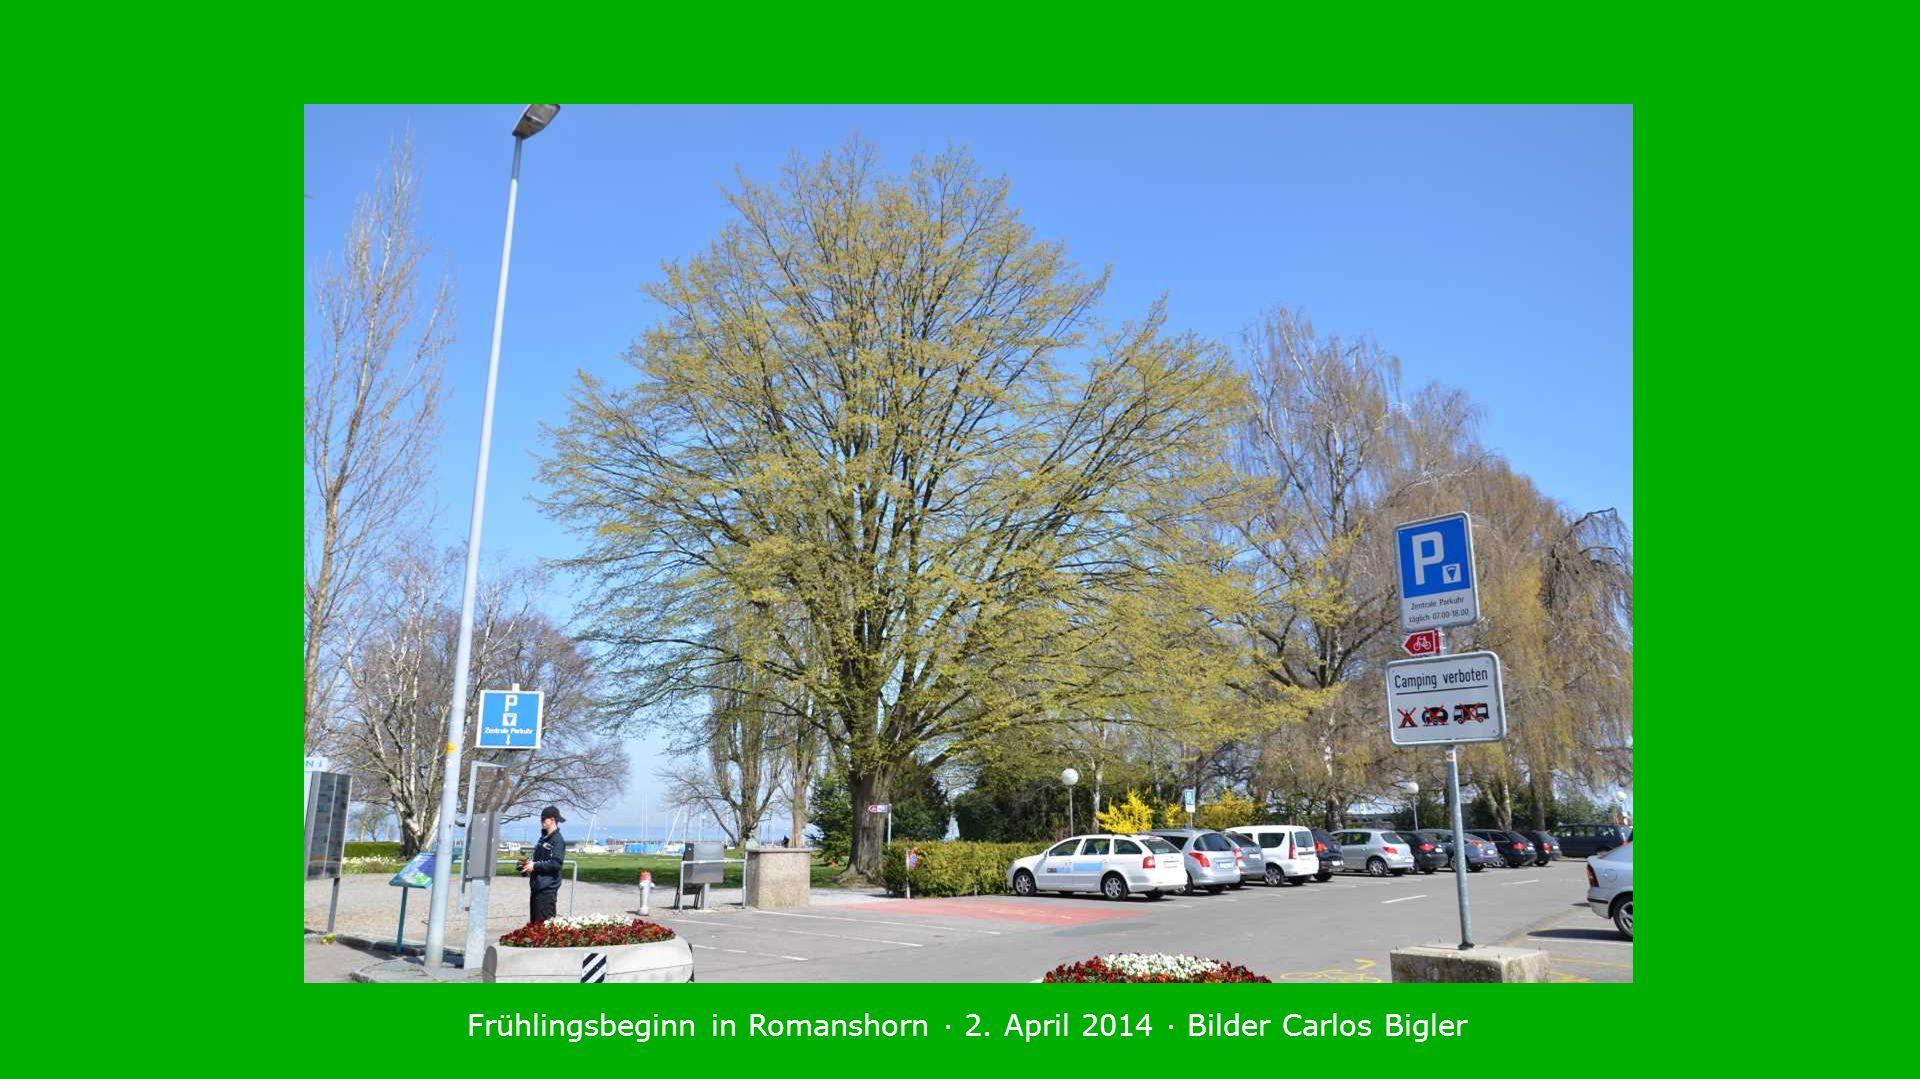 Frühlingsbeginn in Romanshorn · 2. April 2014 · Bilder Carlos Bigler